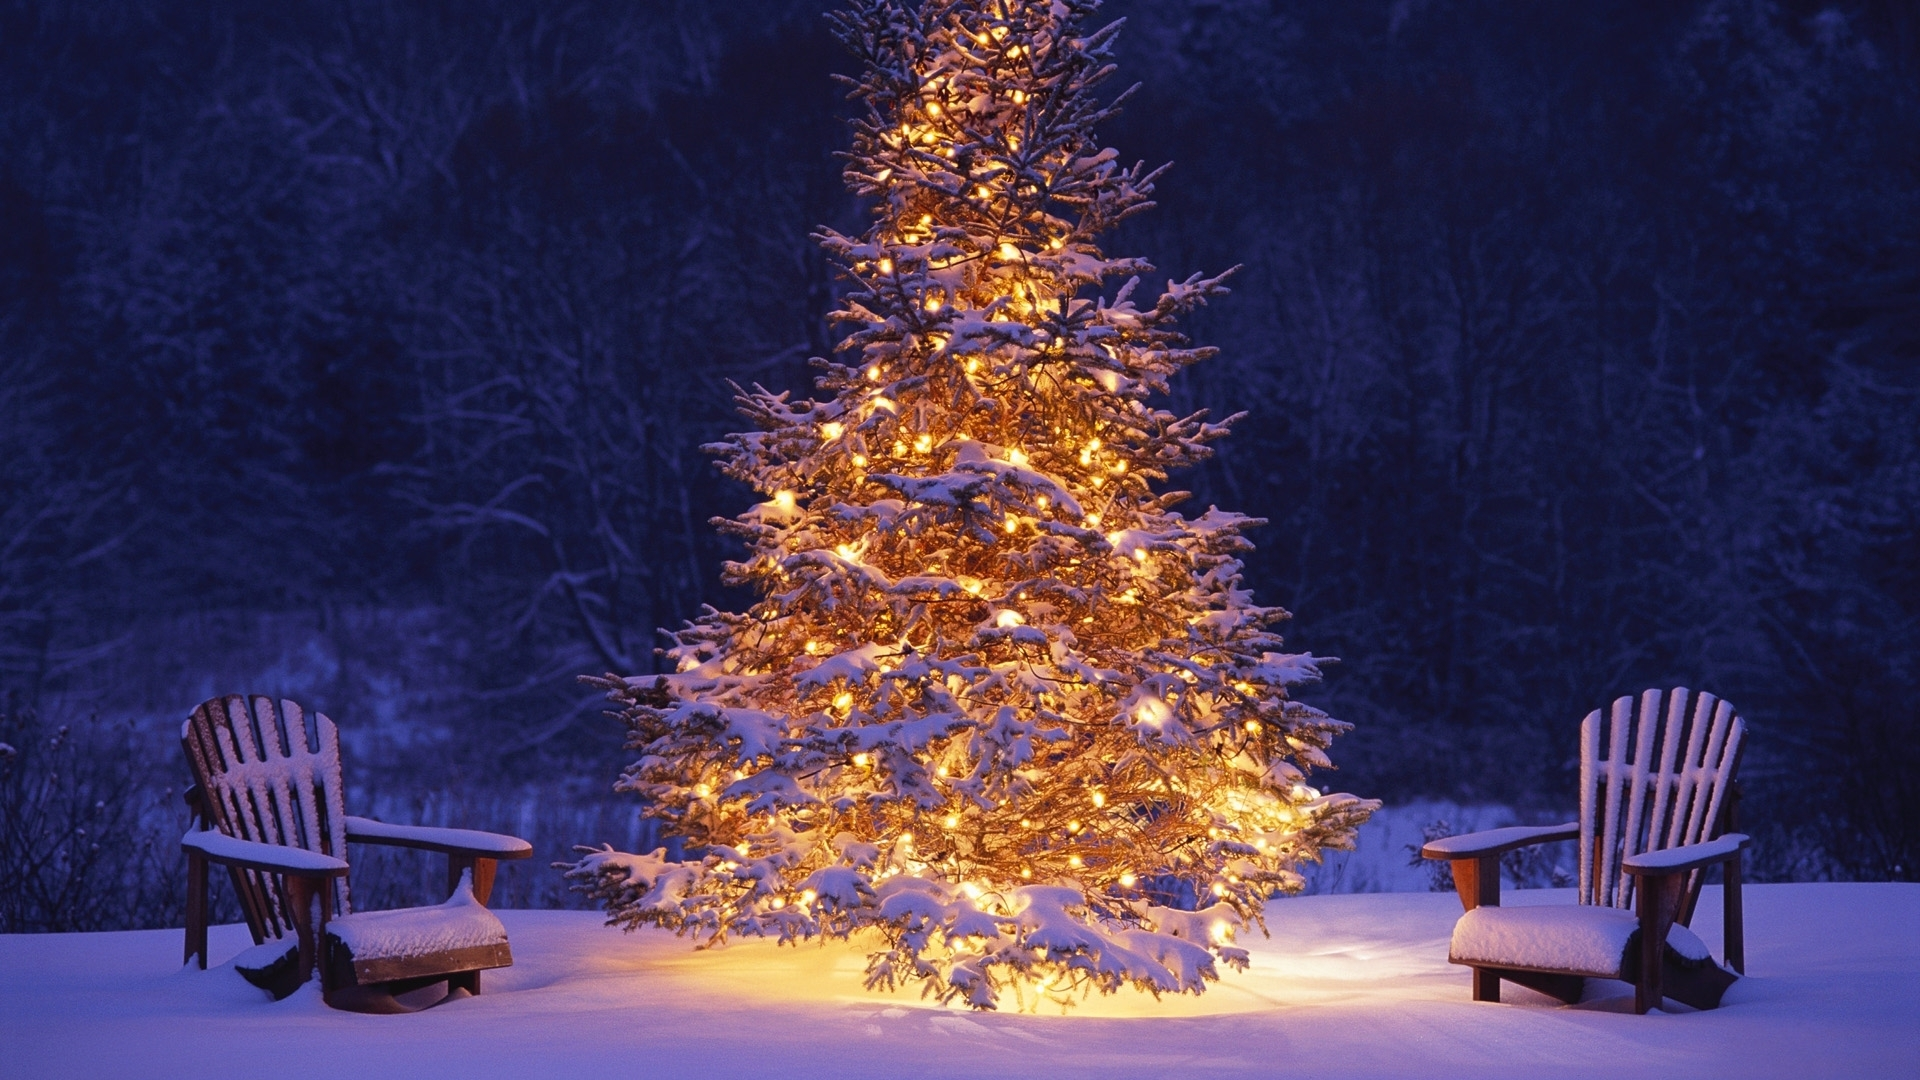 image: hd wallpaper noel christmas 14 - album: wallpaper, wallpapers